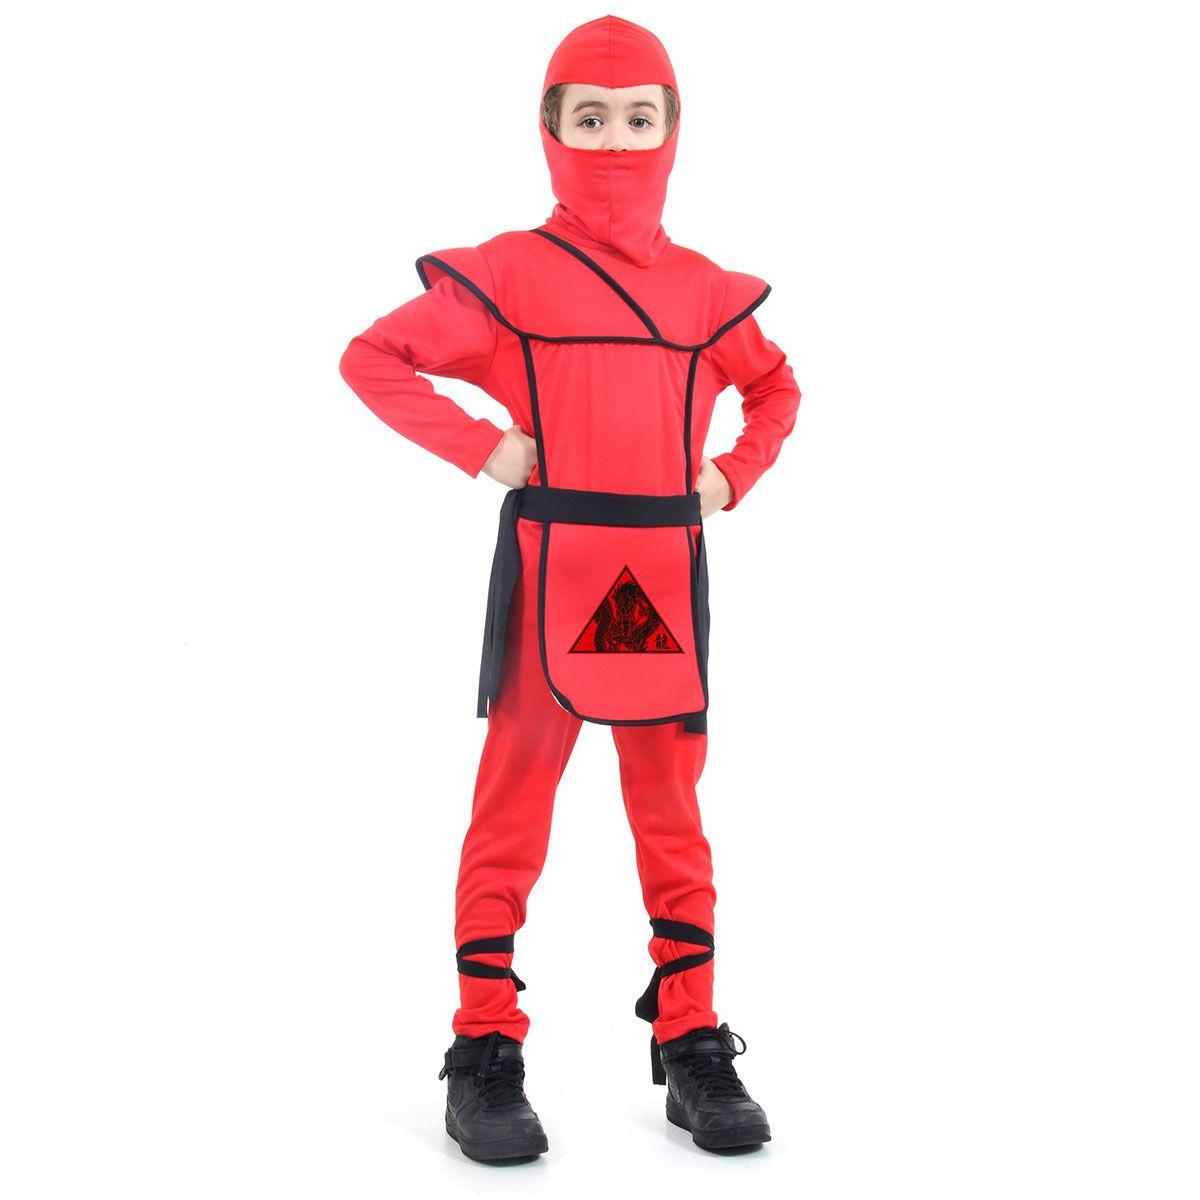 Fantasia Ninja Vermelho Infantil Samurai Luxo